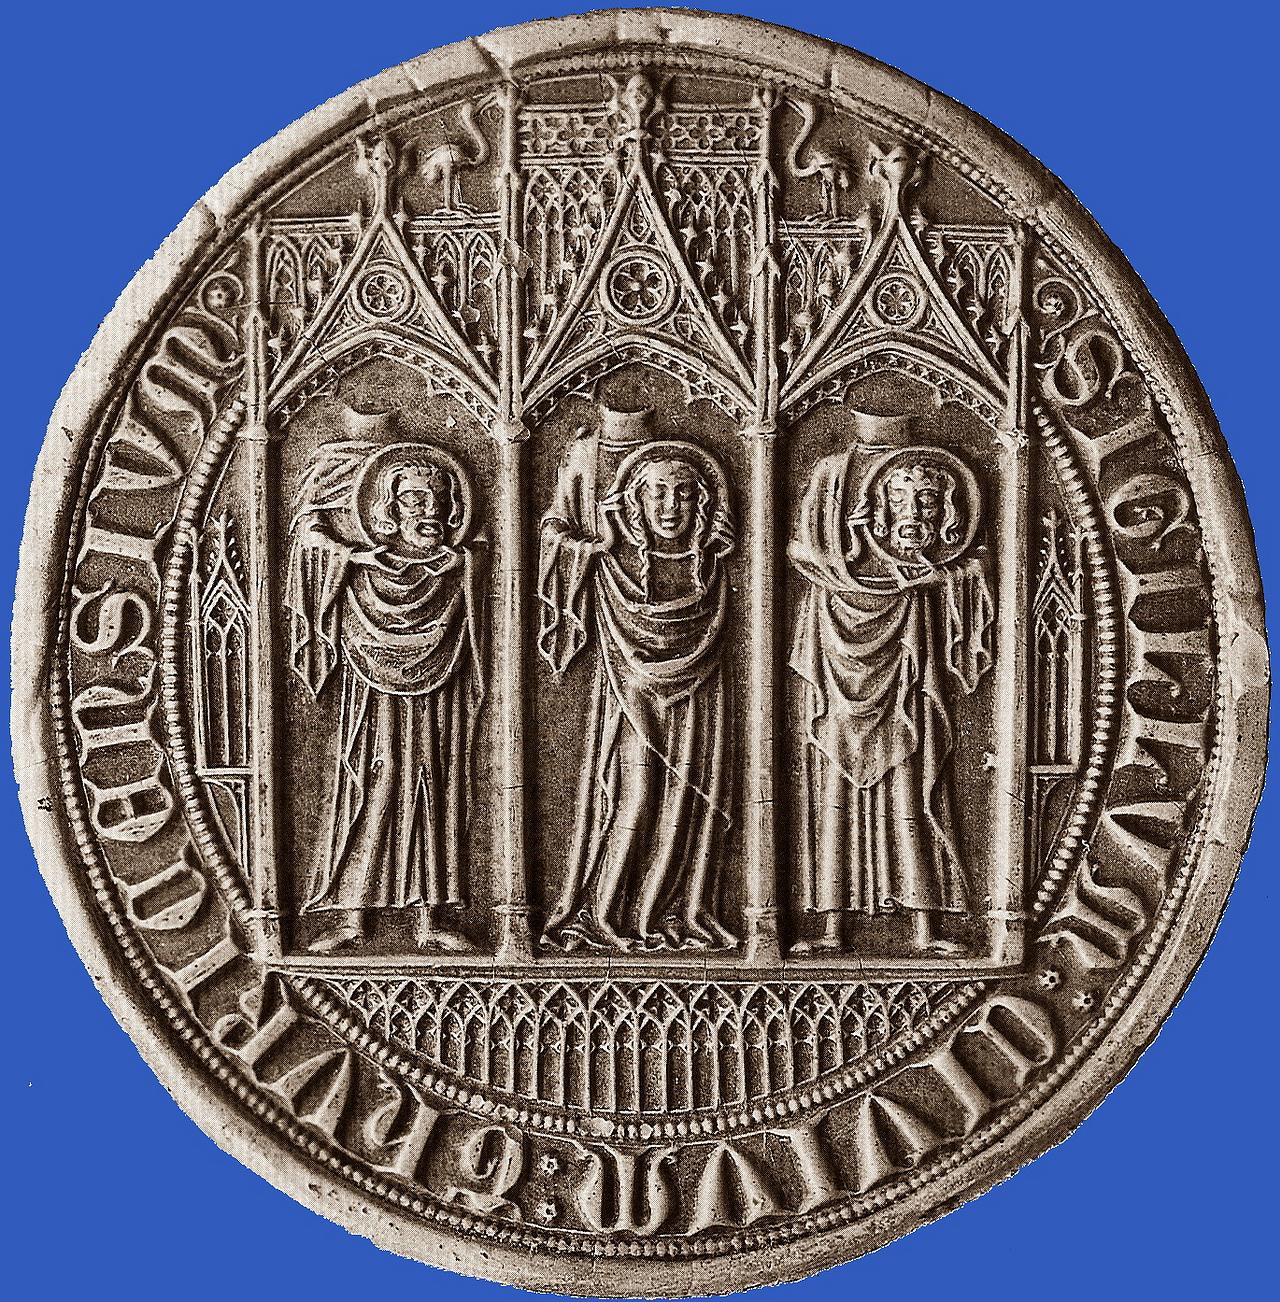 File:Zürich - Stadtsiegel 1347.jpg